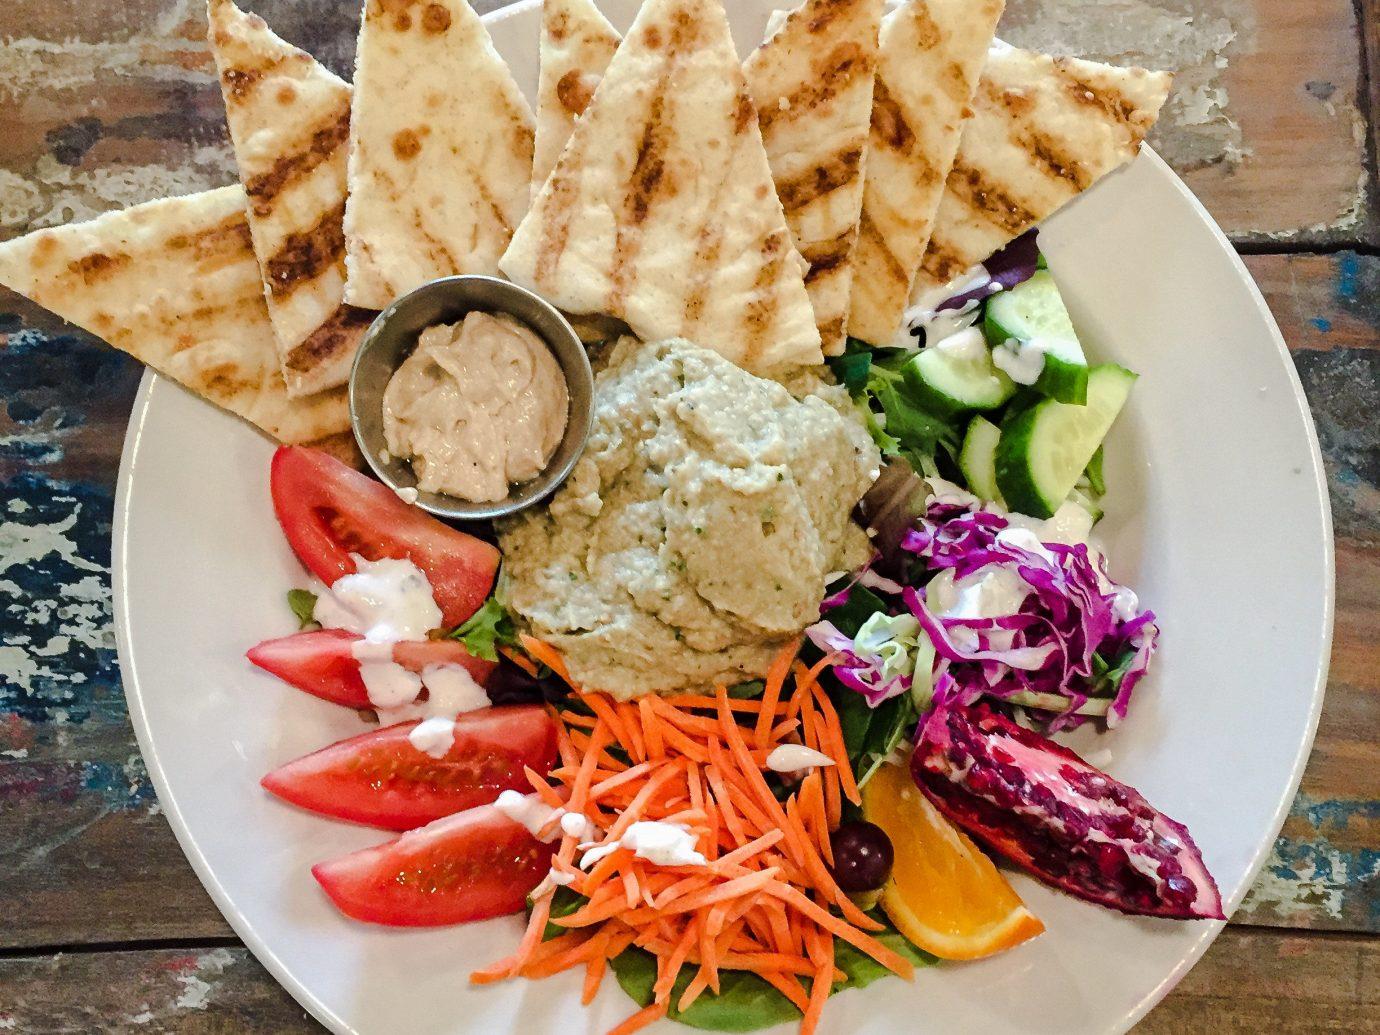 Trip Ideas plate food table dish meal cuisine lunch fish slice produce Seafood meat salad thai food breakfast